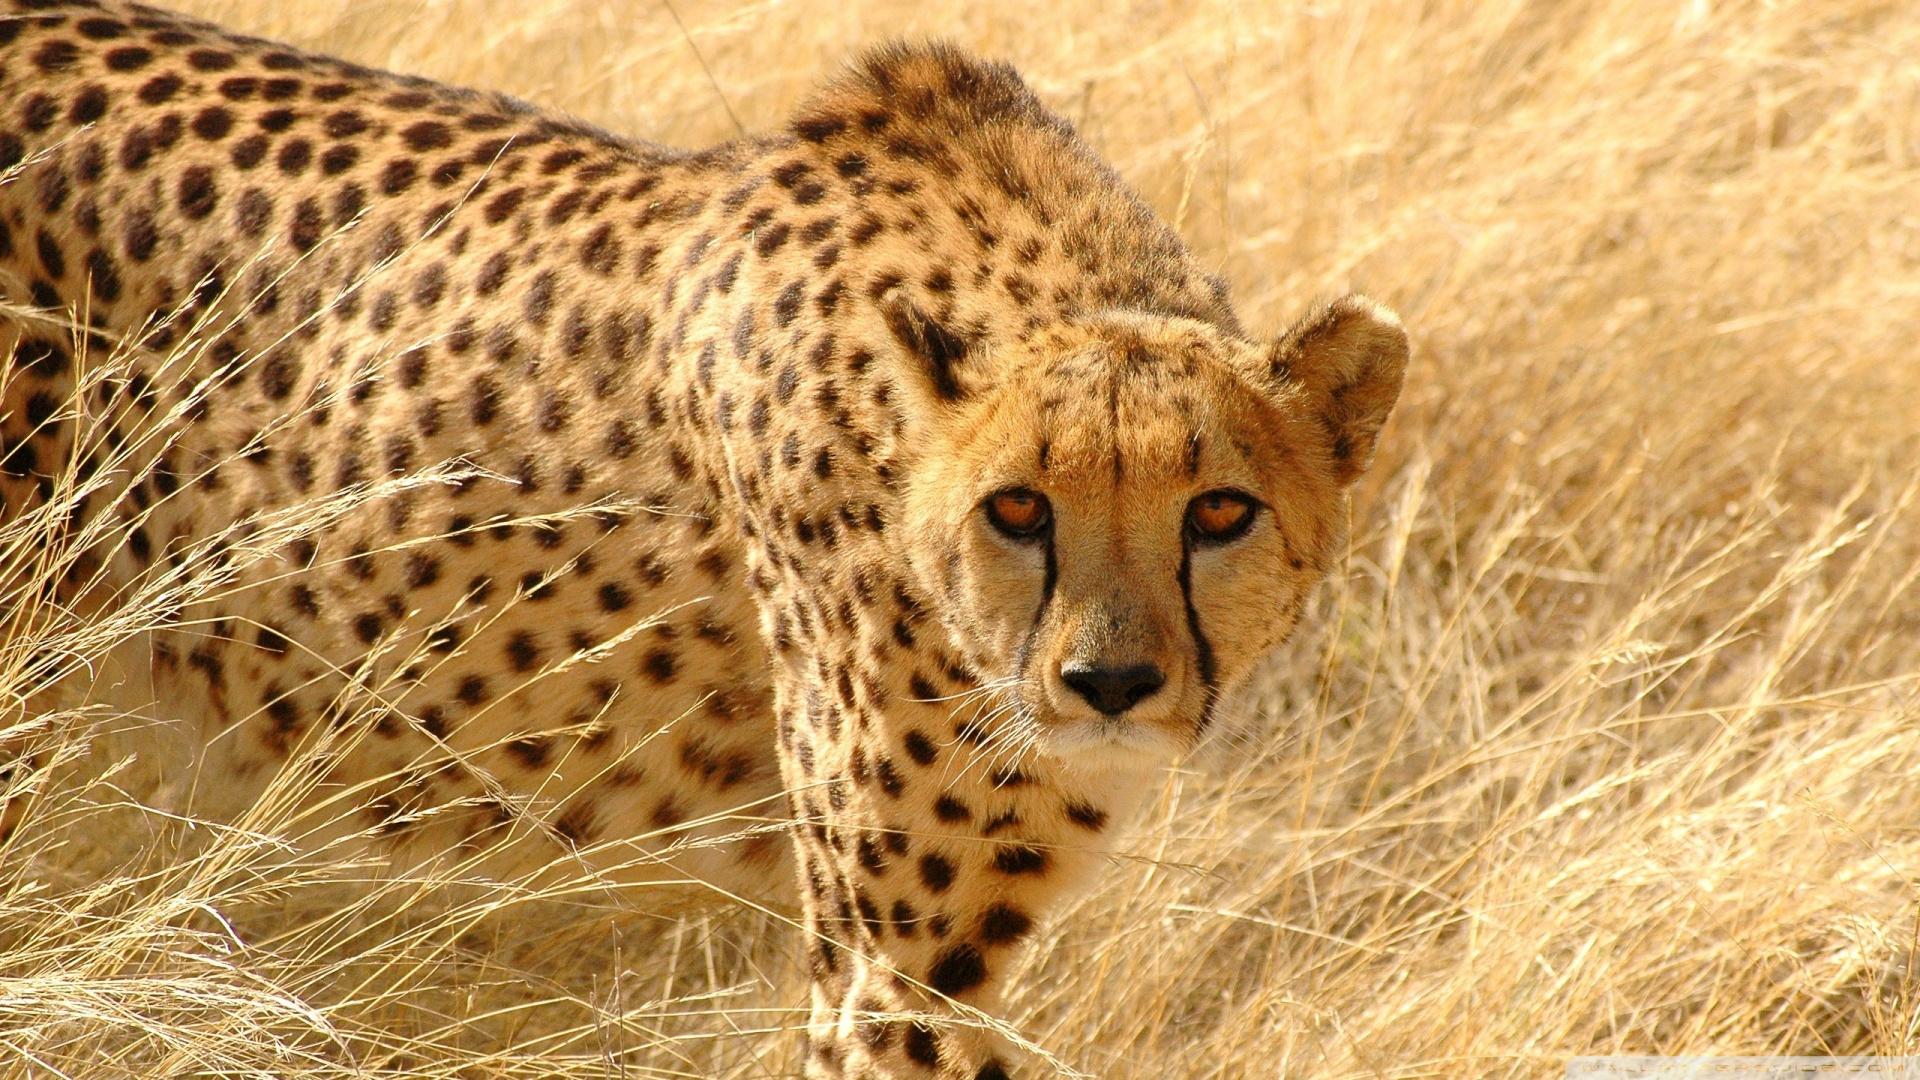 Cheetah Wildlife Backgrounds for Desktop